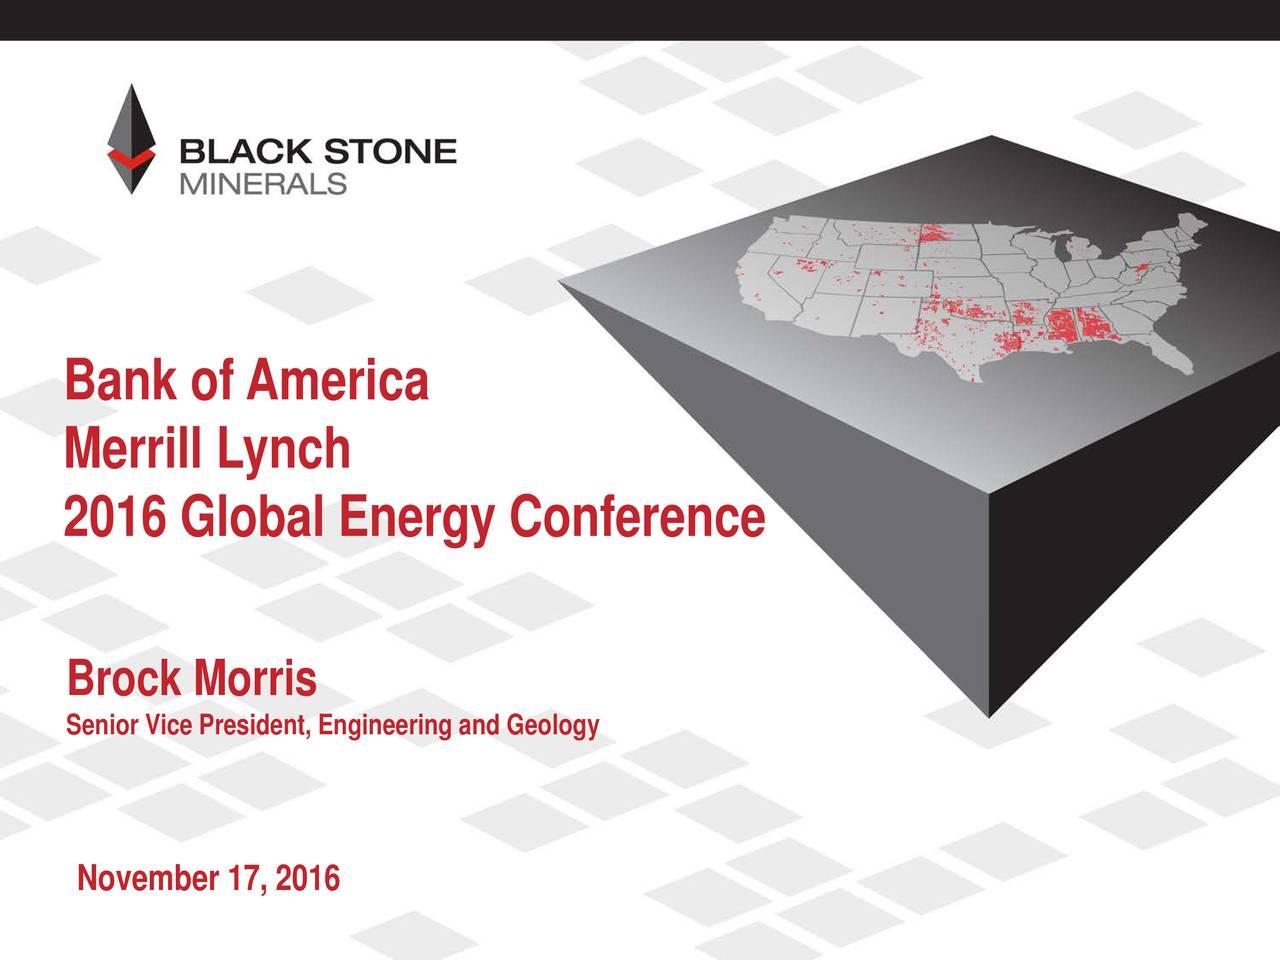 Merrill Lynch 2016 Global Energy Conference Brock Morris Senior Vice President, Engineering and Geology November 17, 2016